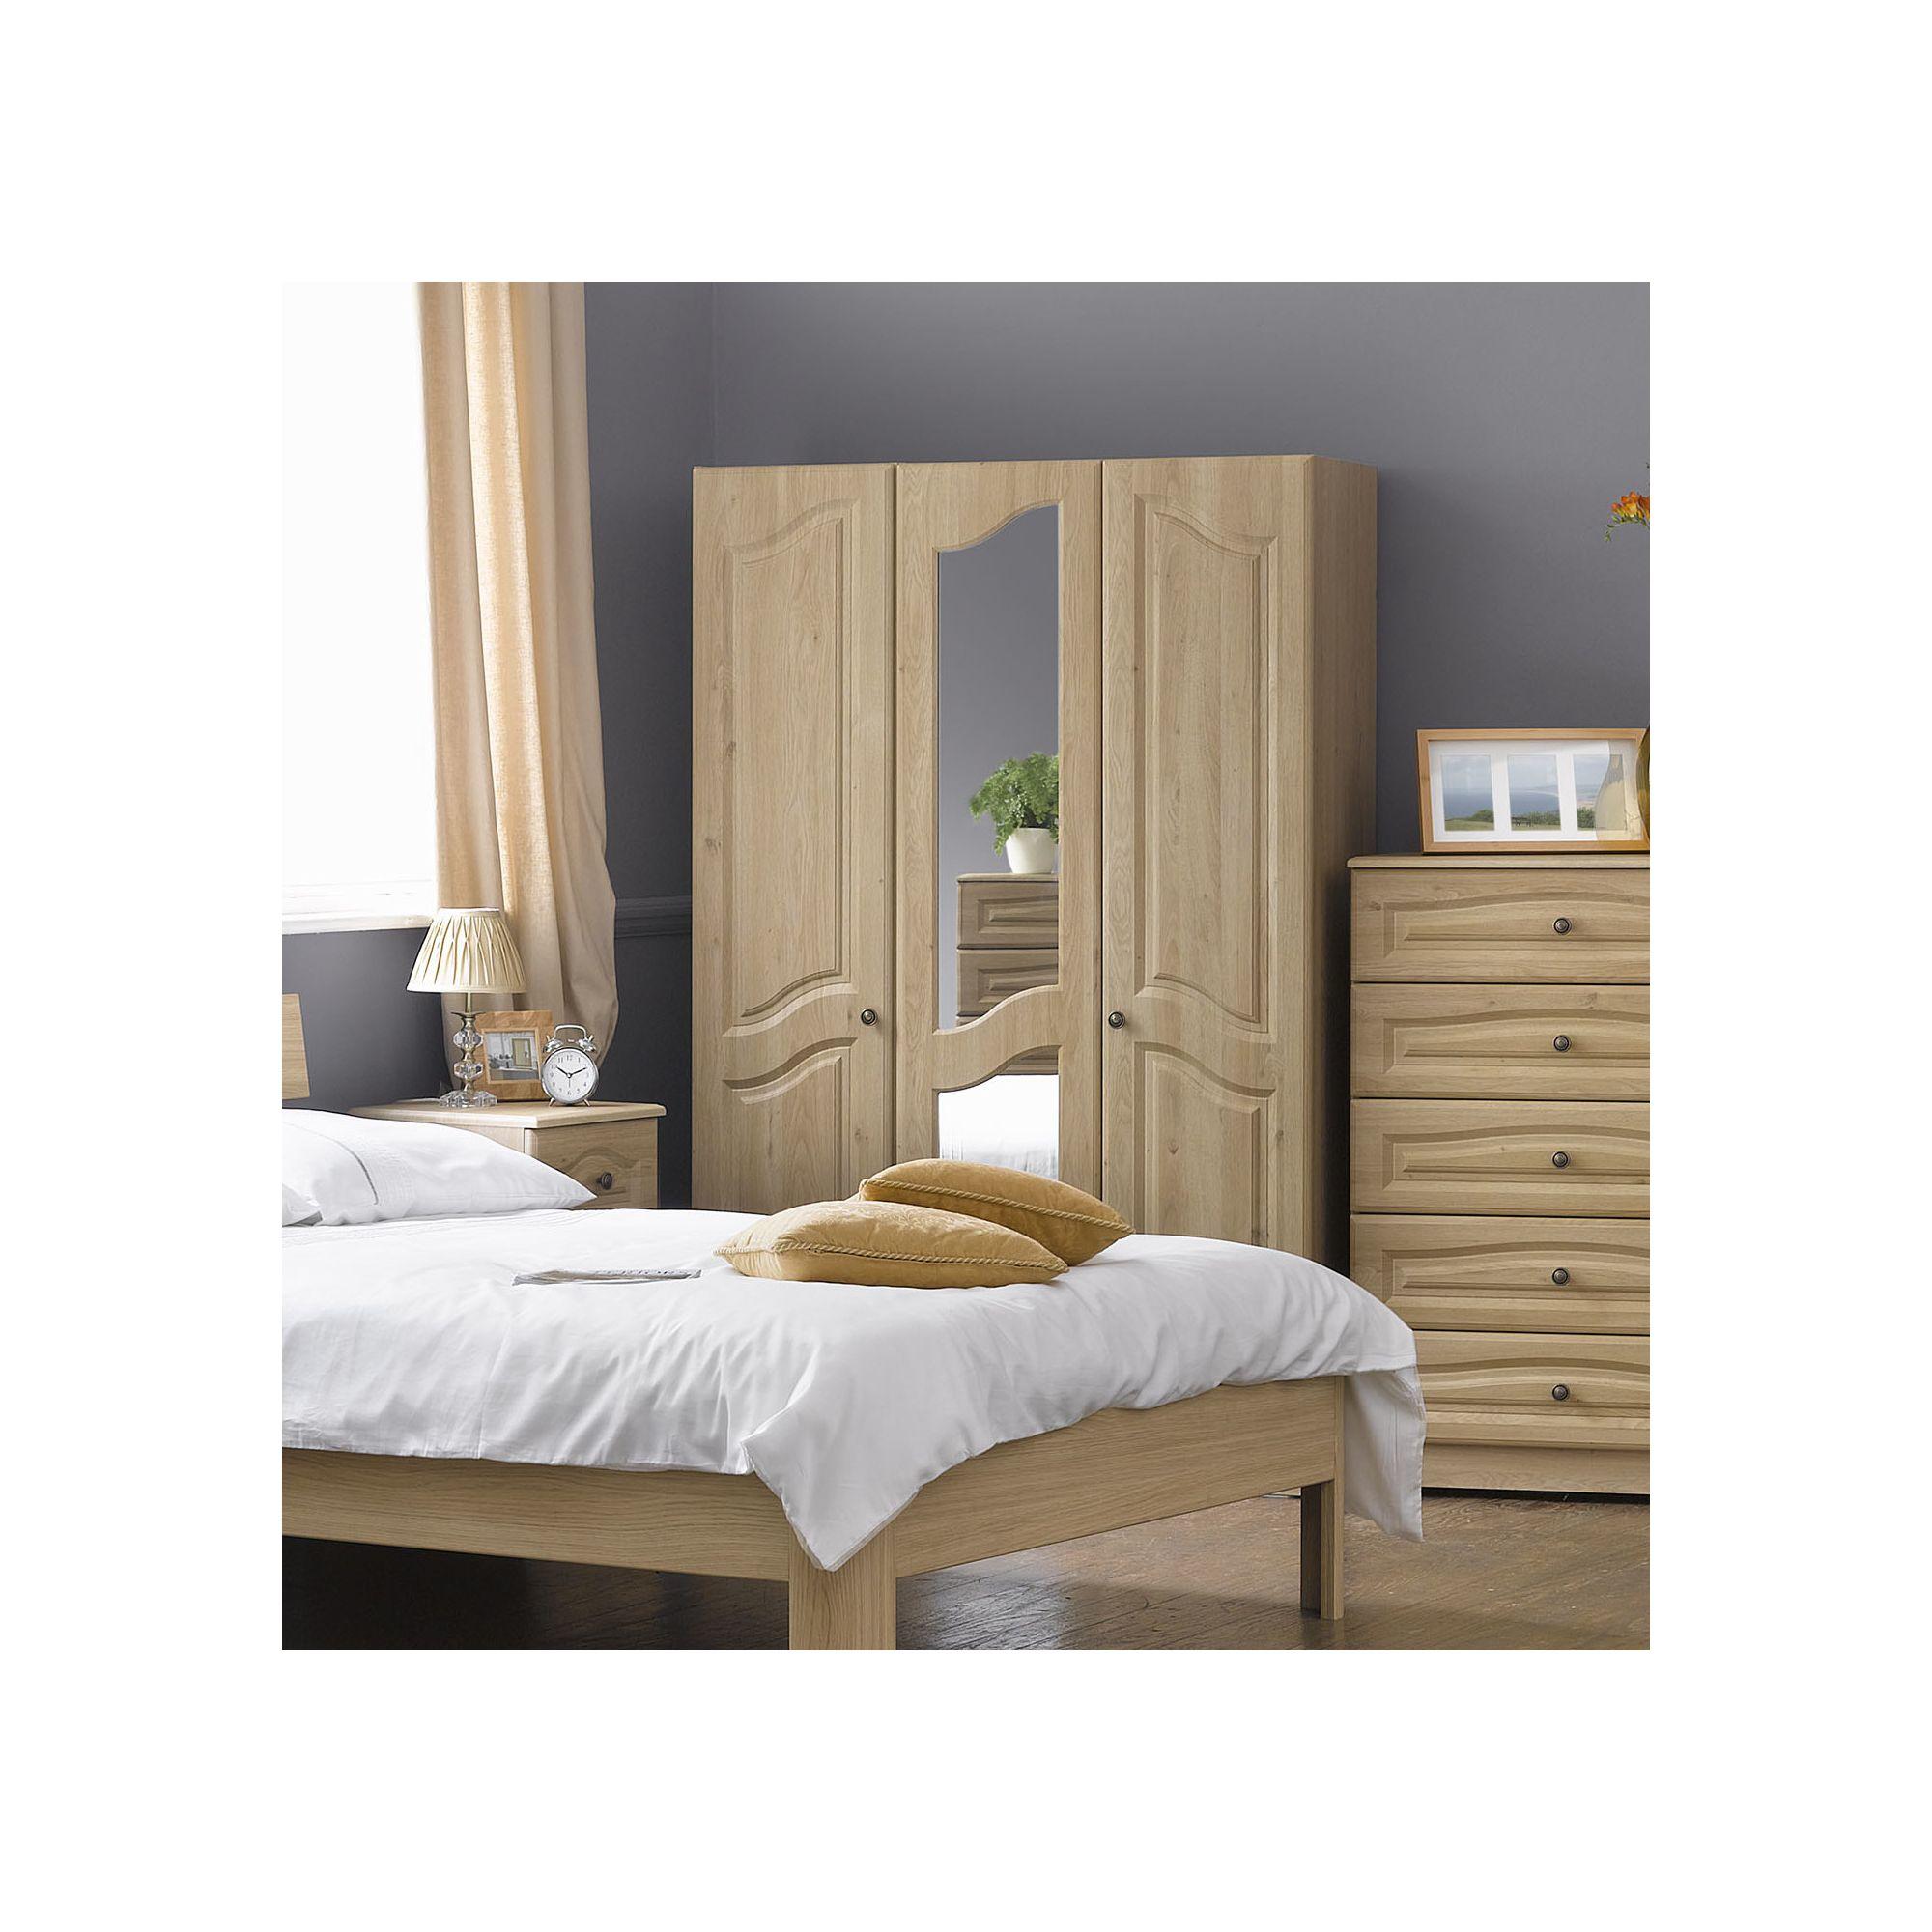 Alto Furniture Visualise Bordeaux Three Door Robe in Oak at Tesco Direct